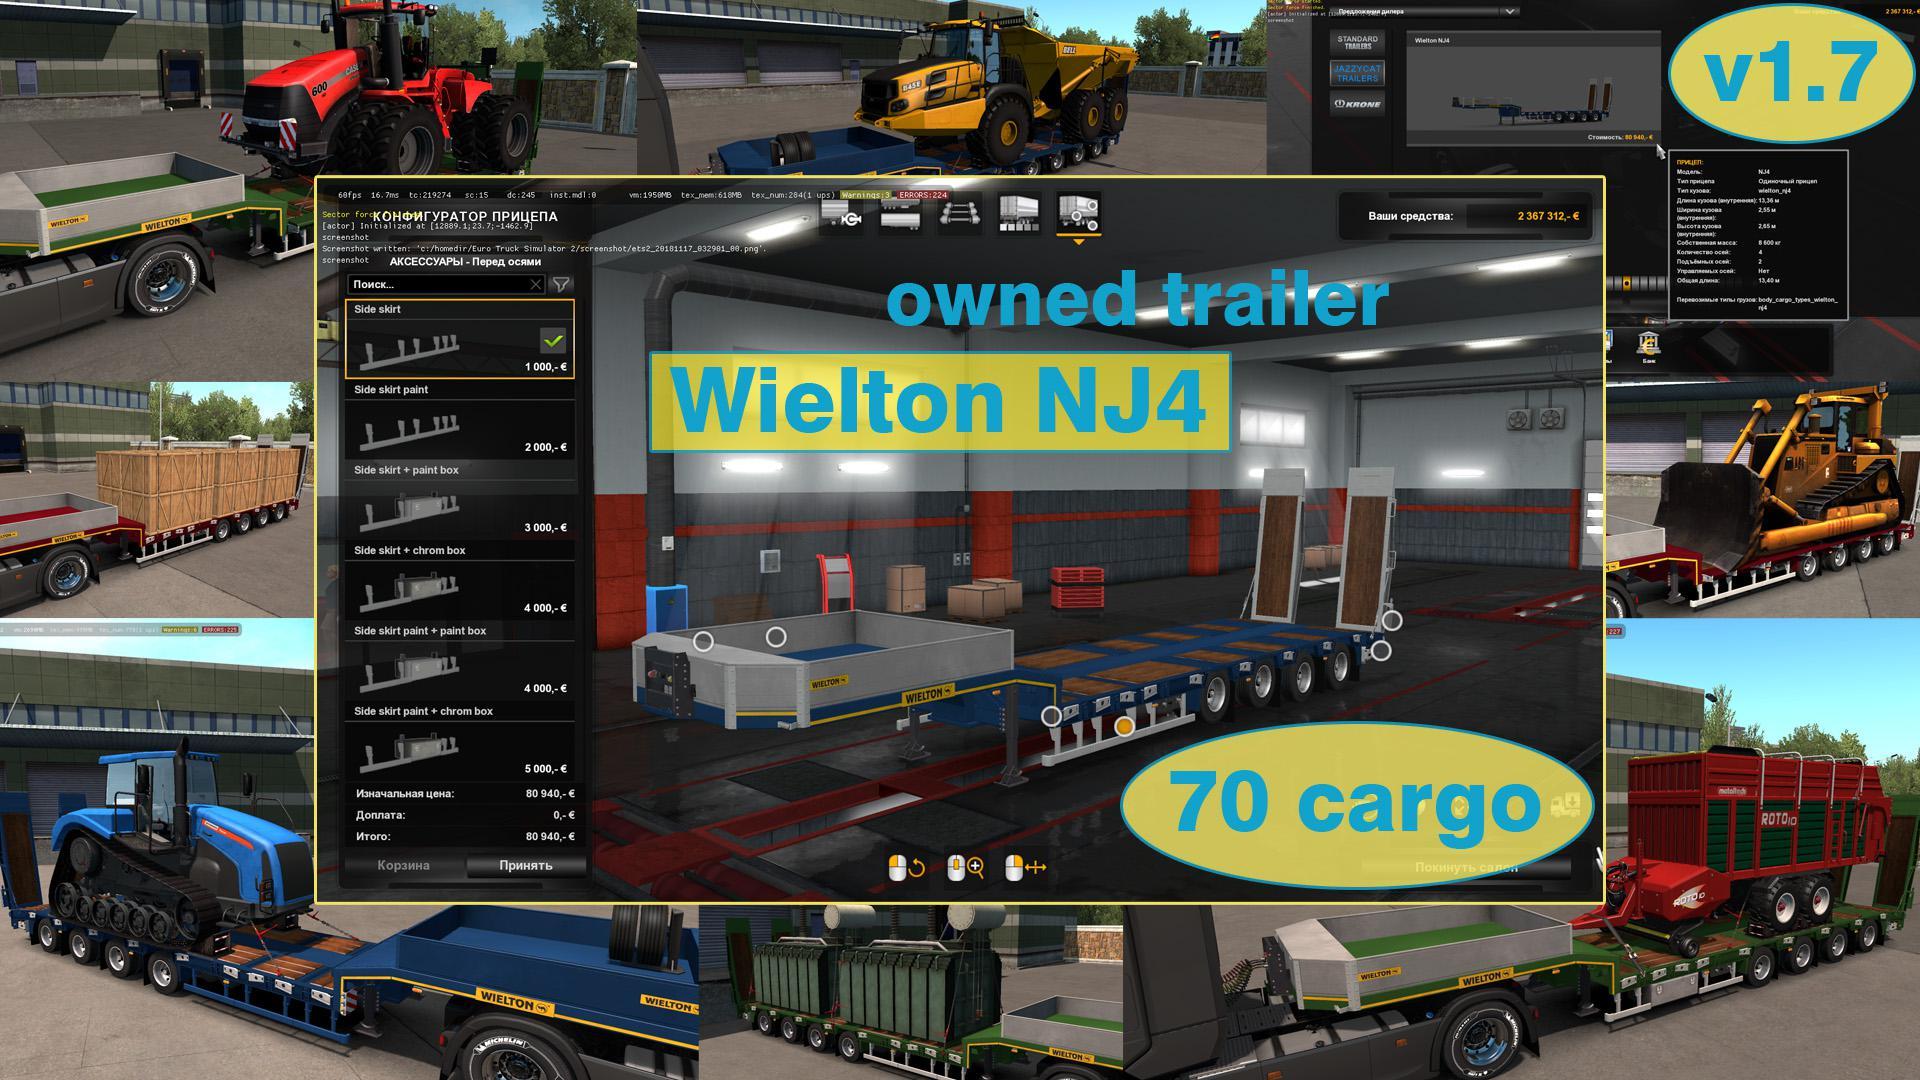 OWNABLE OVERWEIGHT TRAILER WIELTON NJ4 V1 7 1 34 X | ETS2